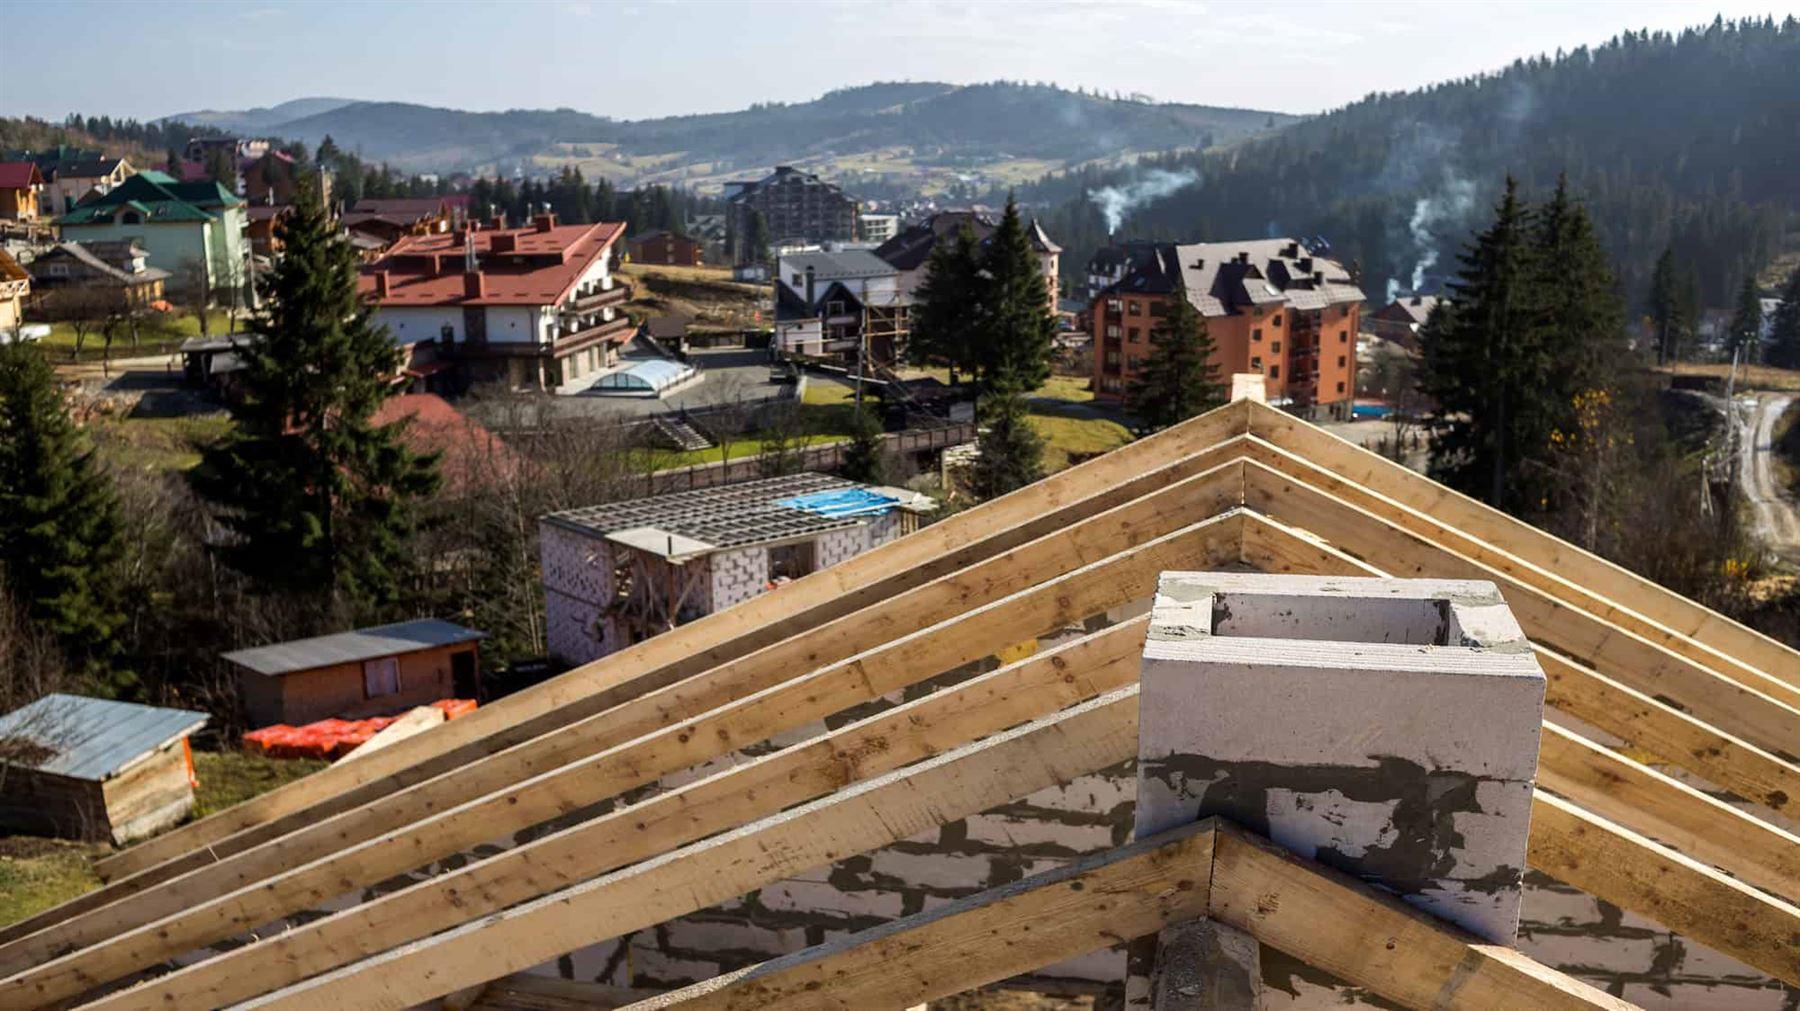 Platinum Roofing & Renovation LLC